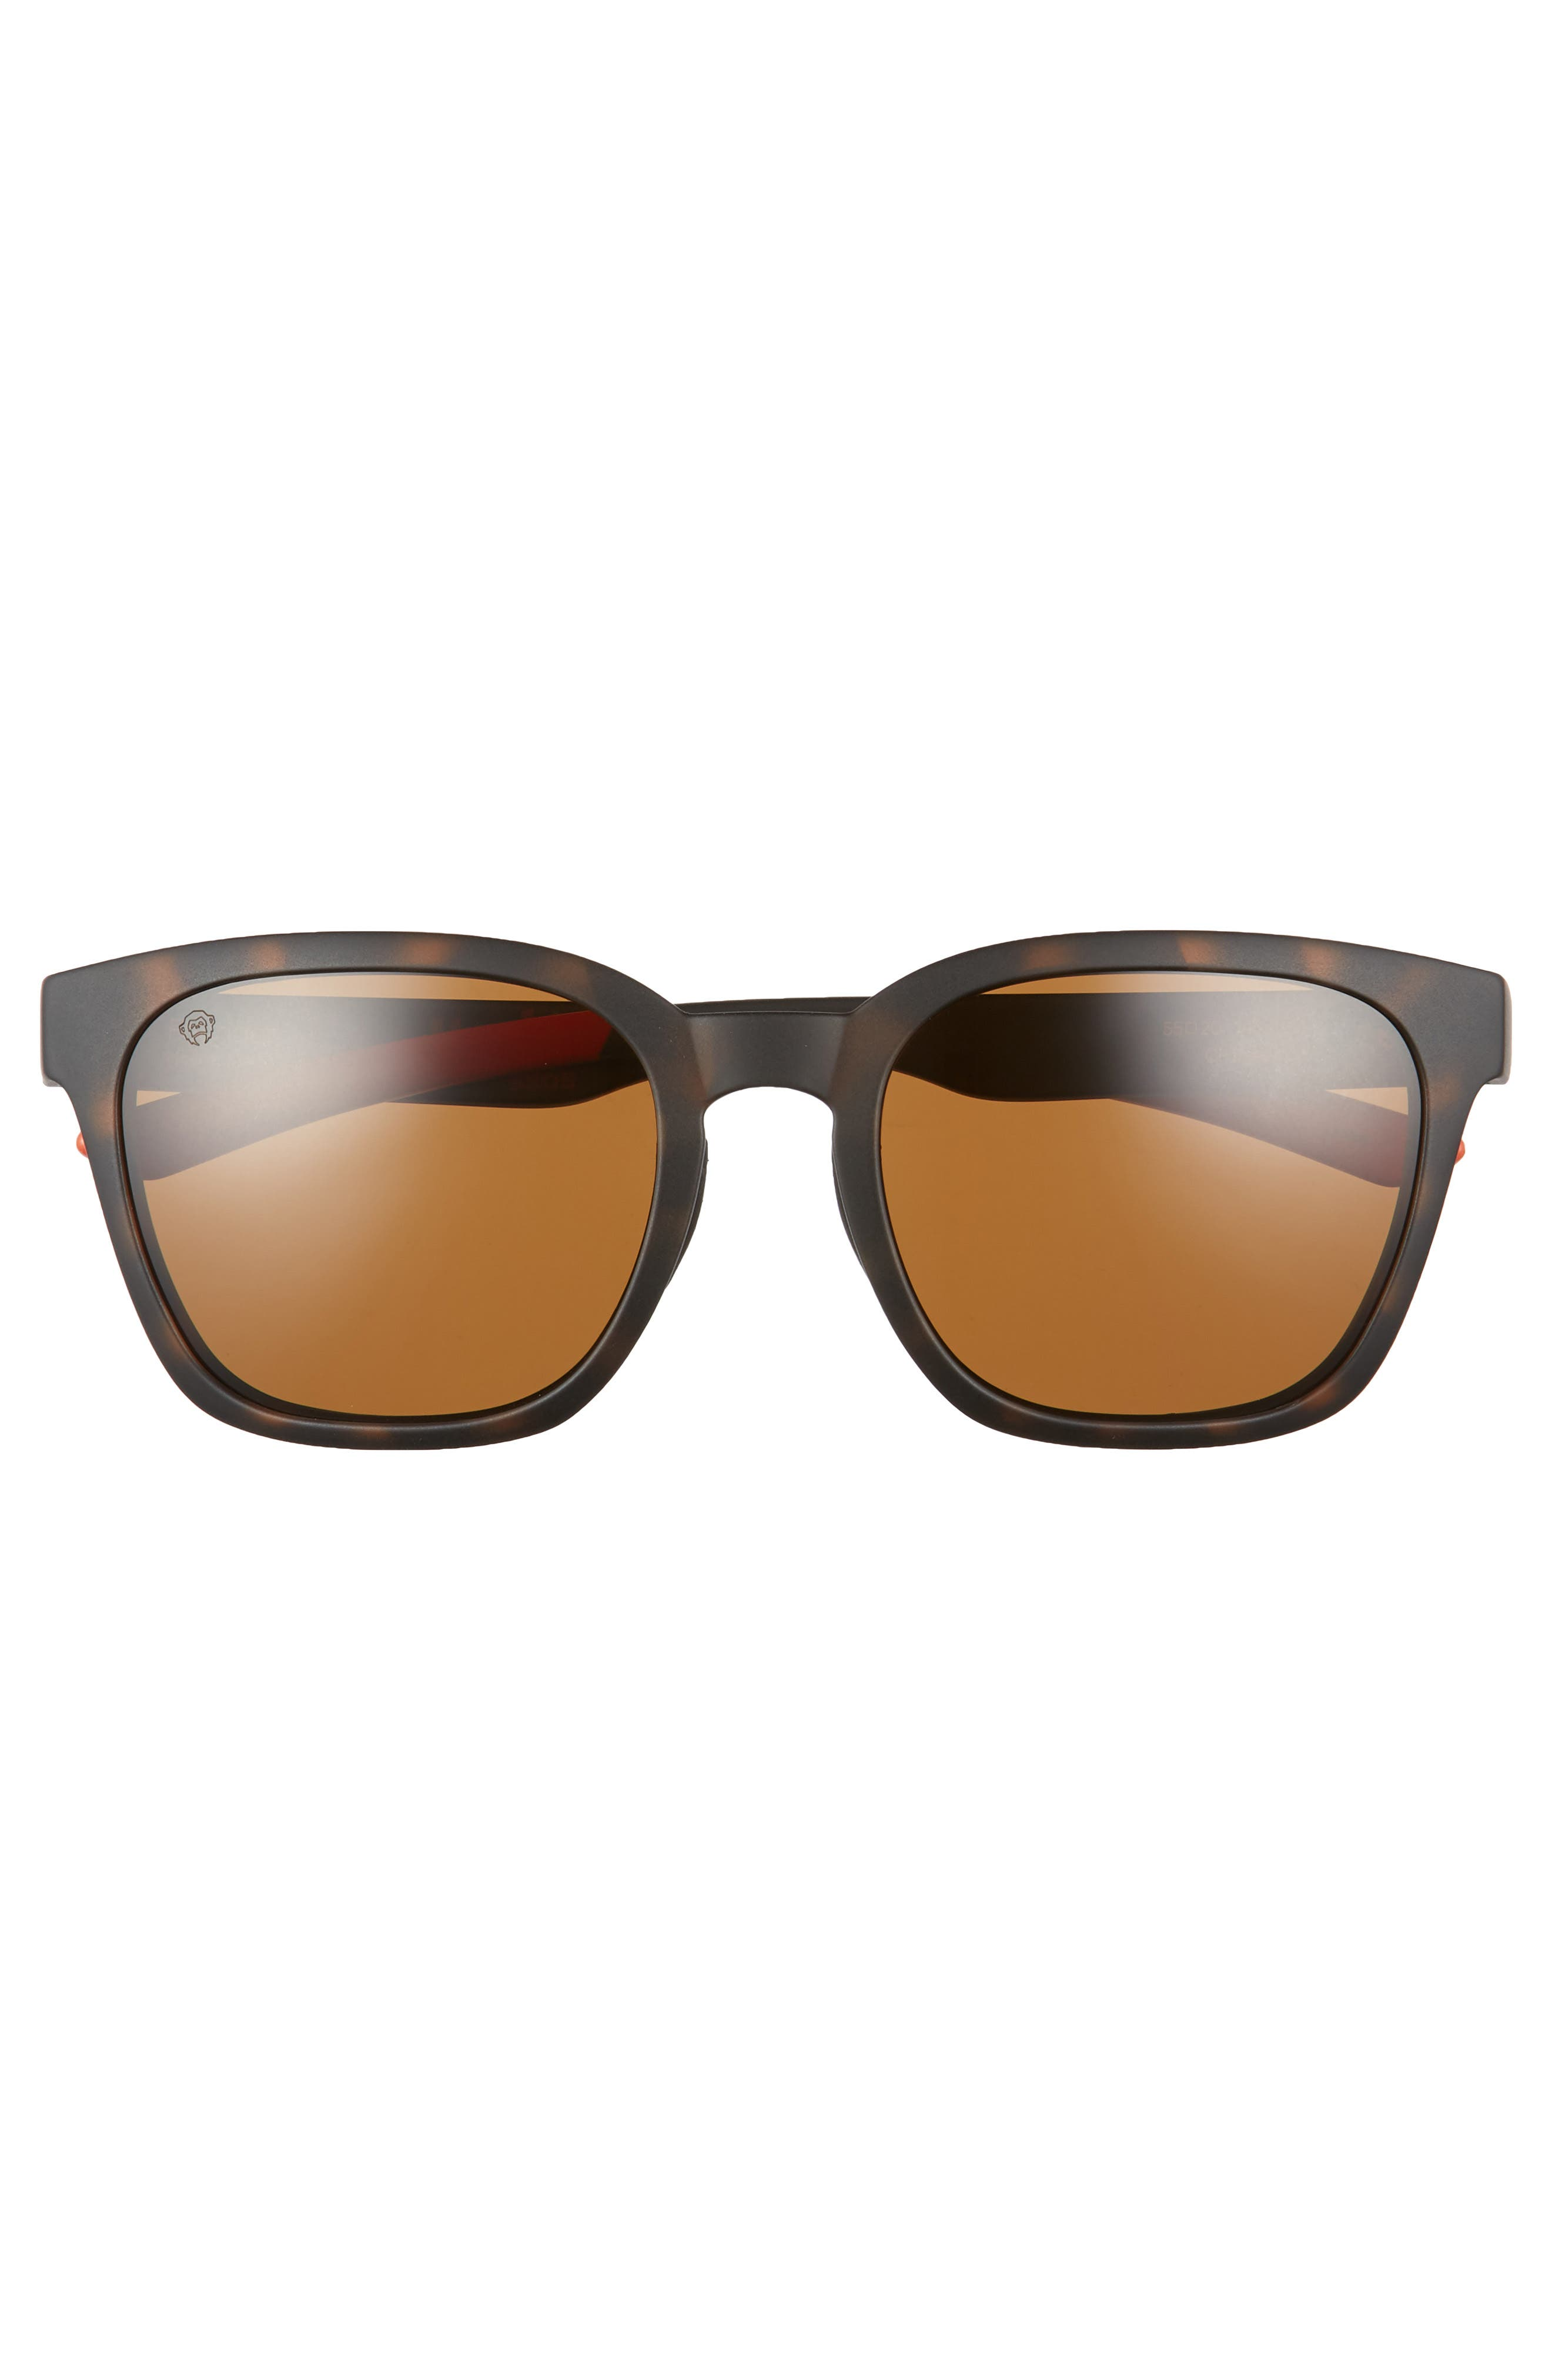 Founder 56mm ChromaPop Polarized Sunglasses,                             Alternate thumbnail 3, color,                             201